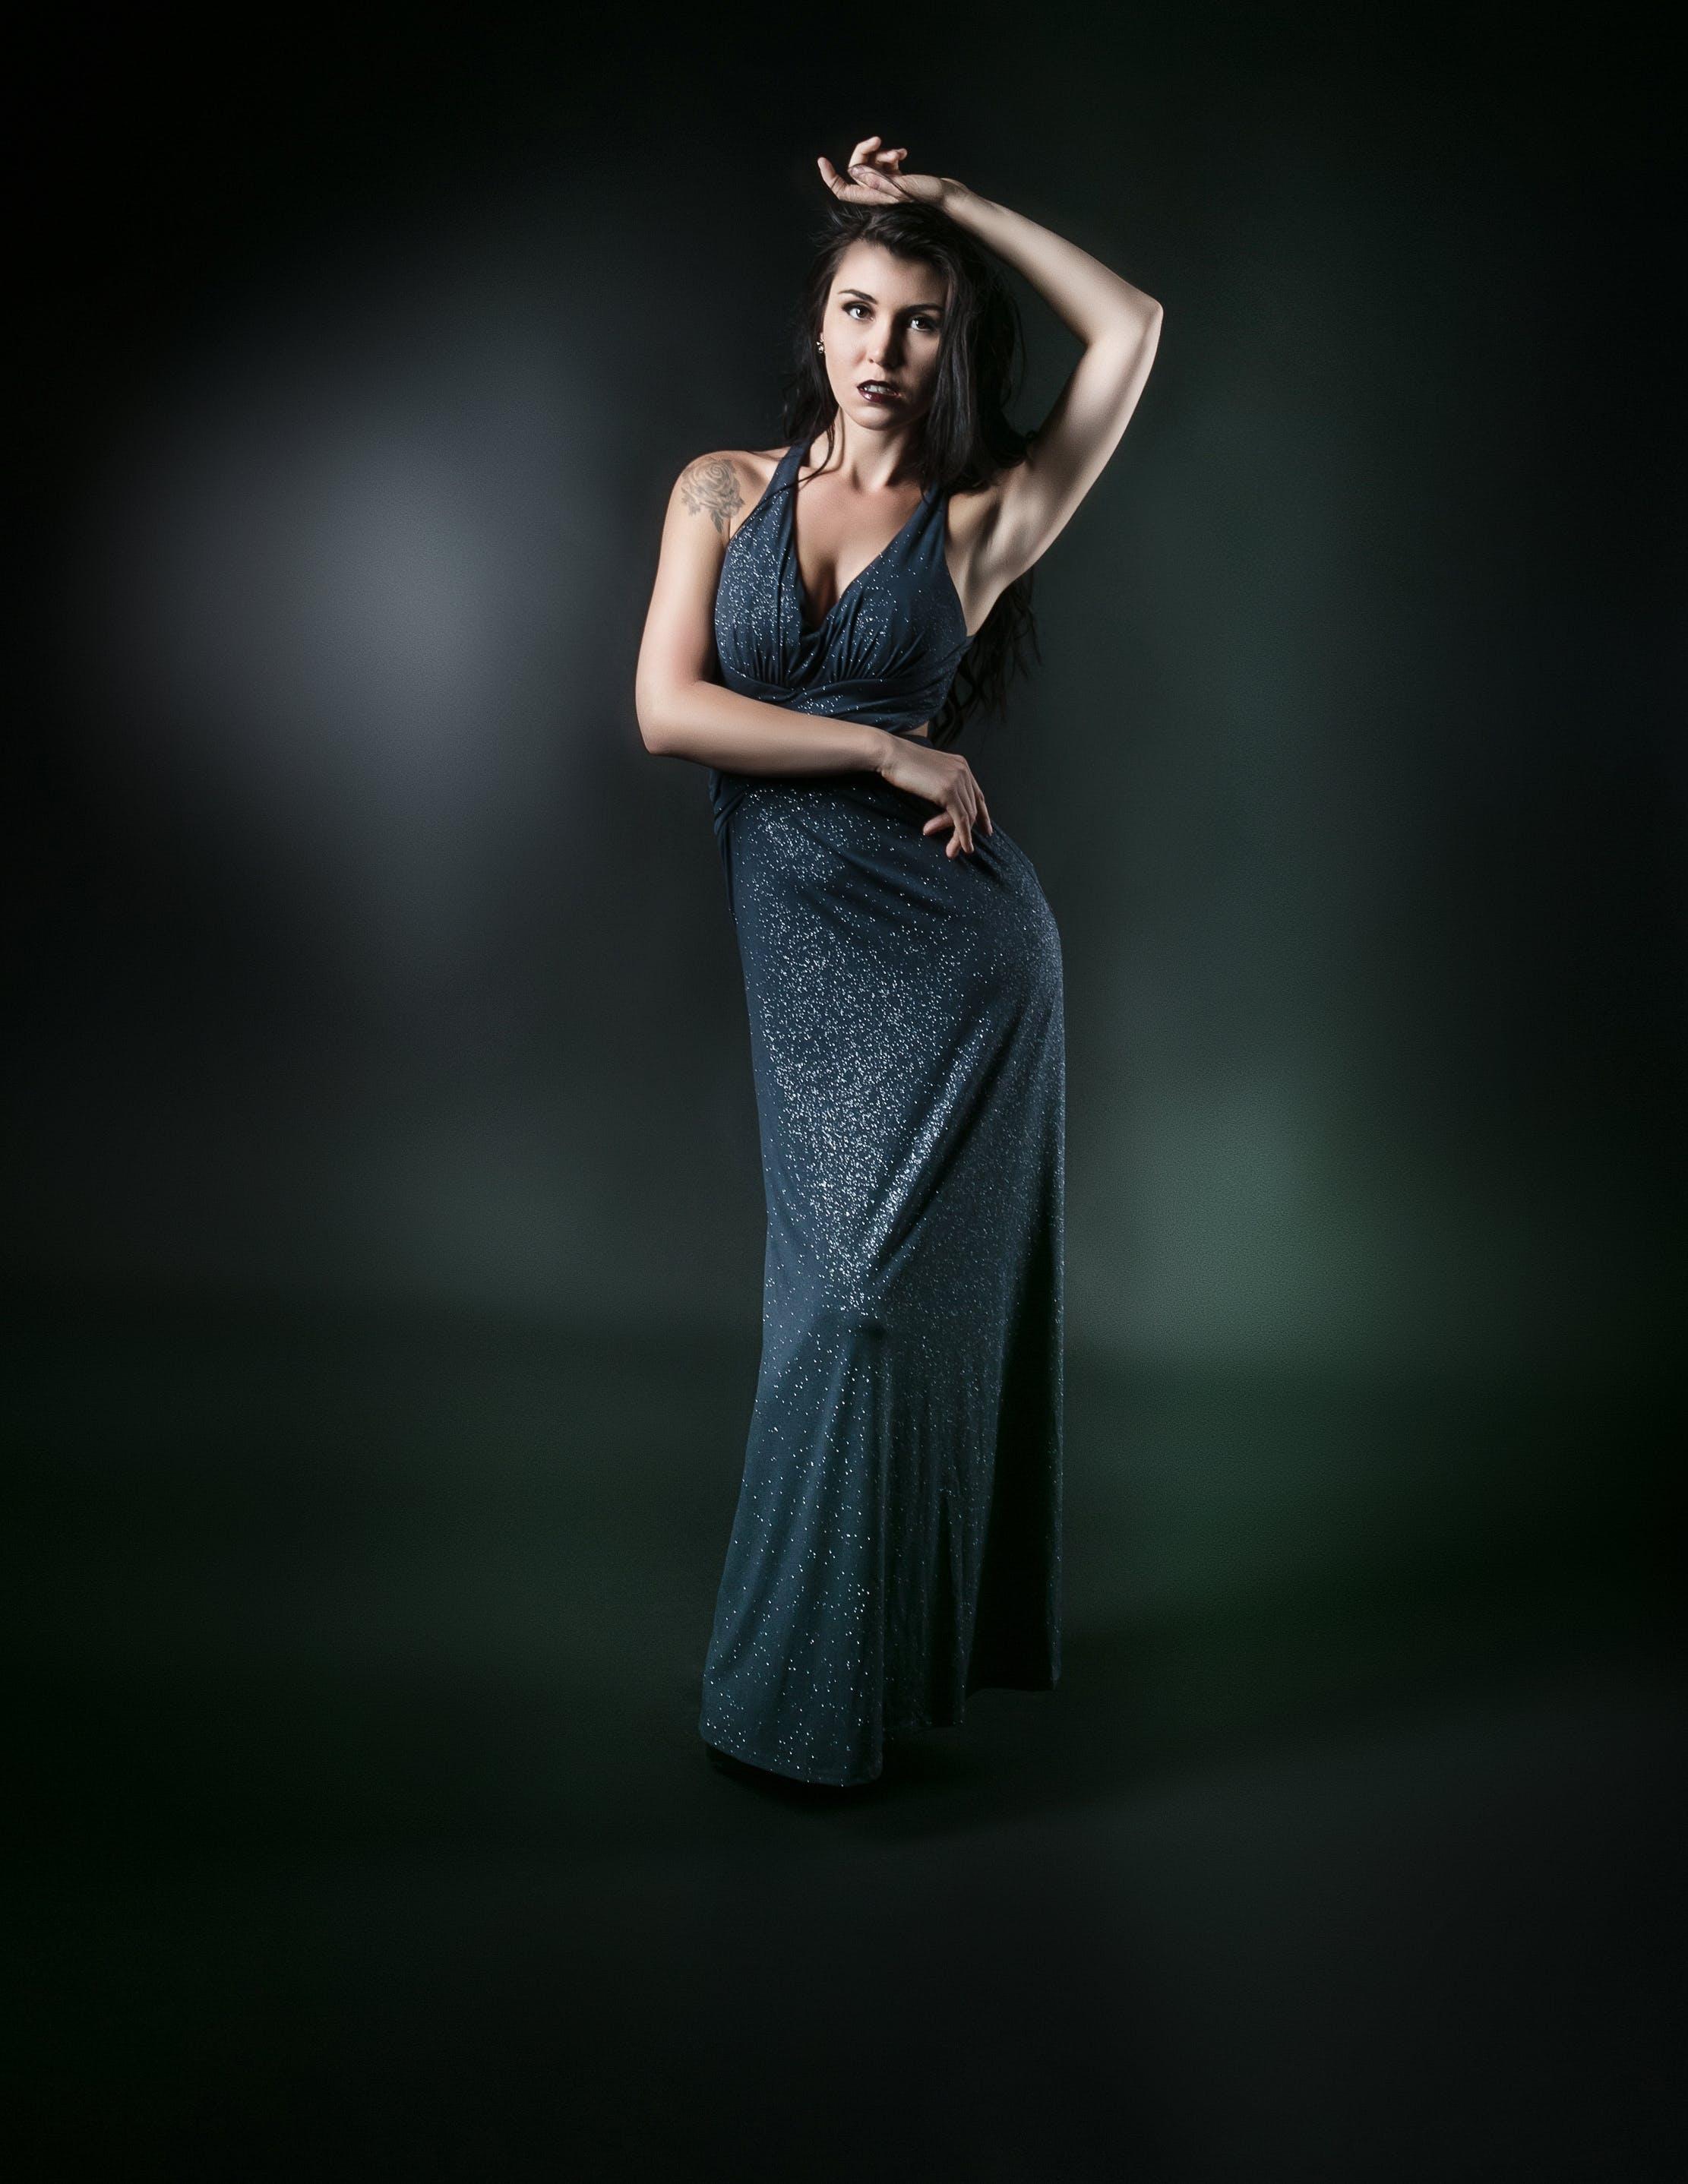 Standing Woman in Gray Surplice Sleeveless Dress